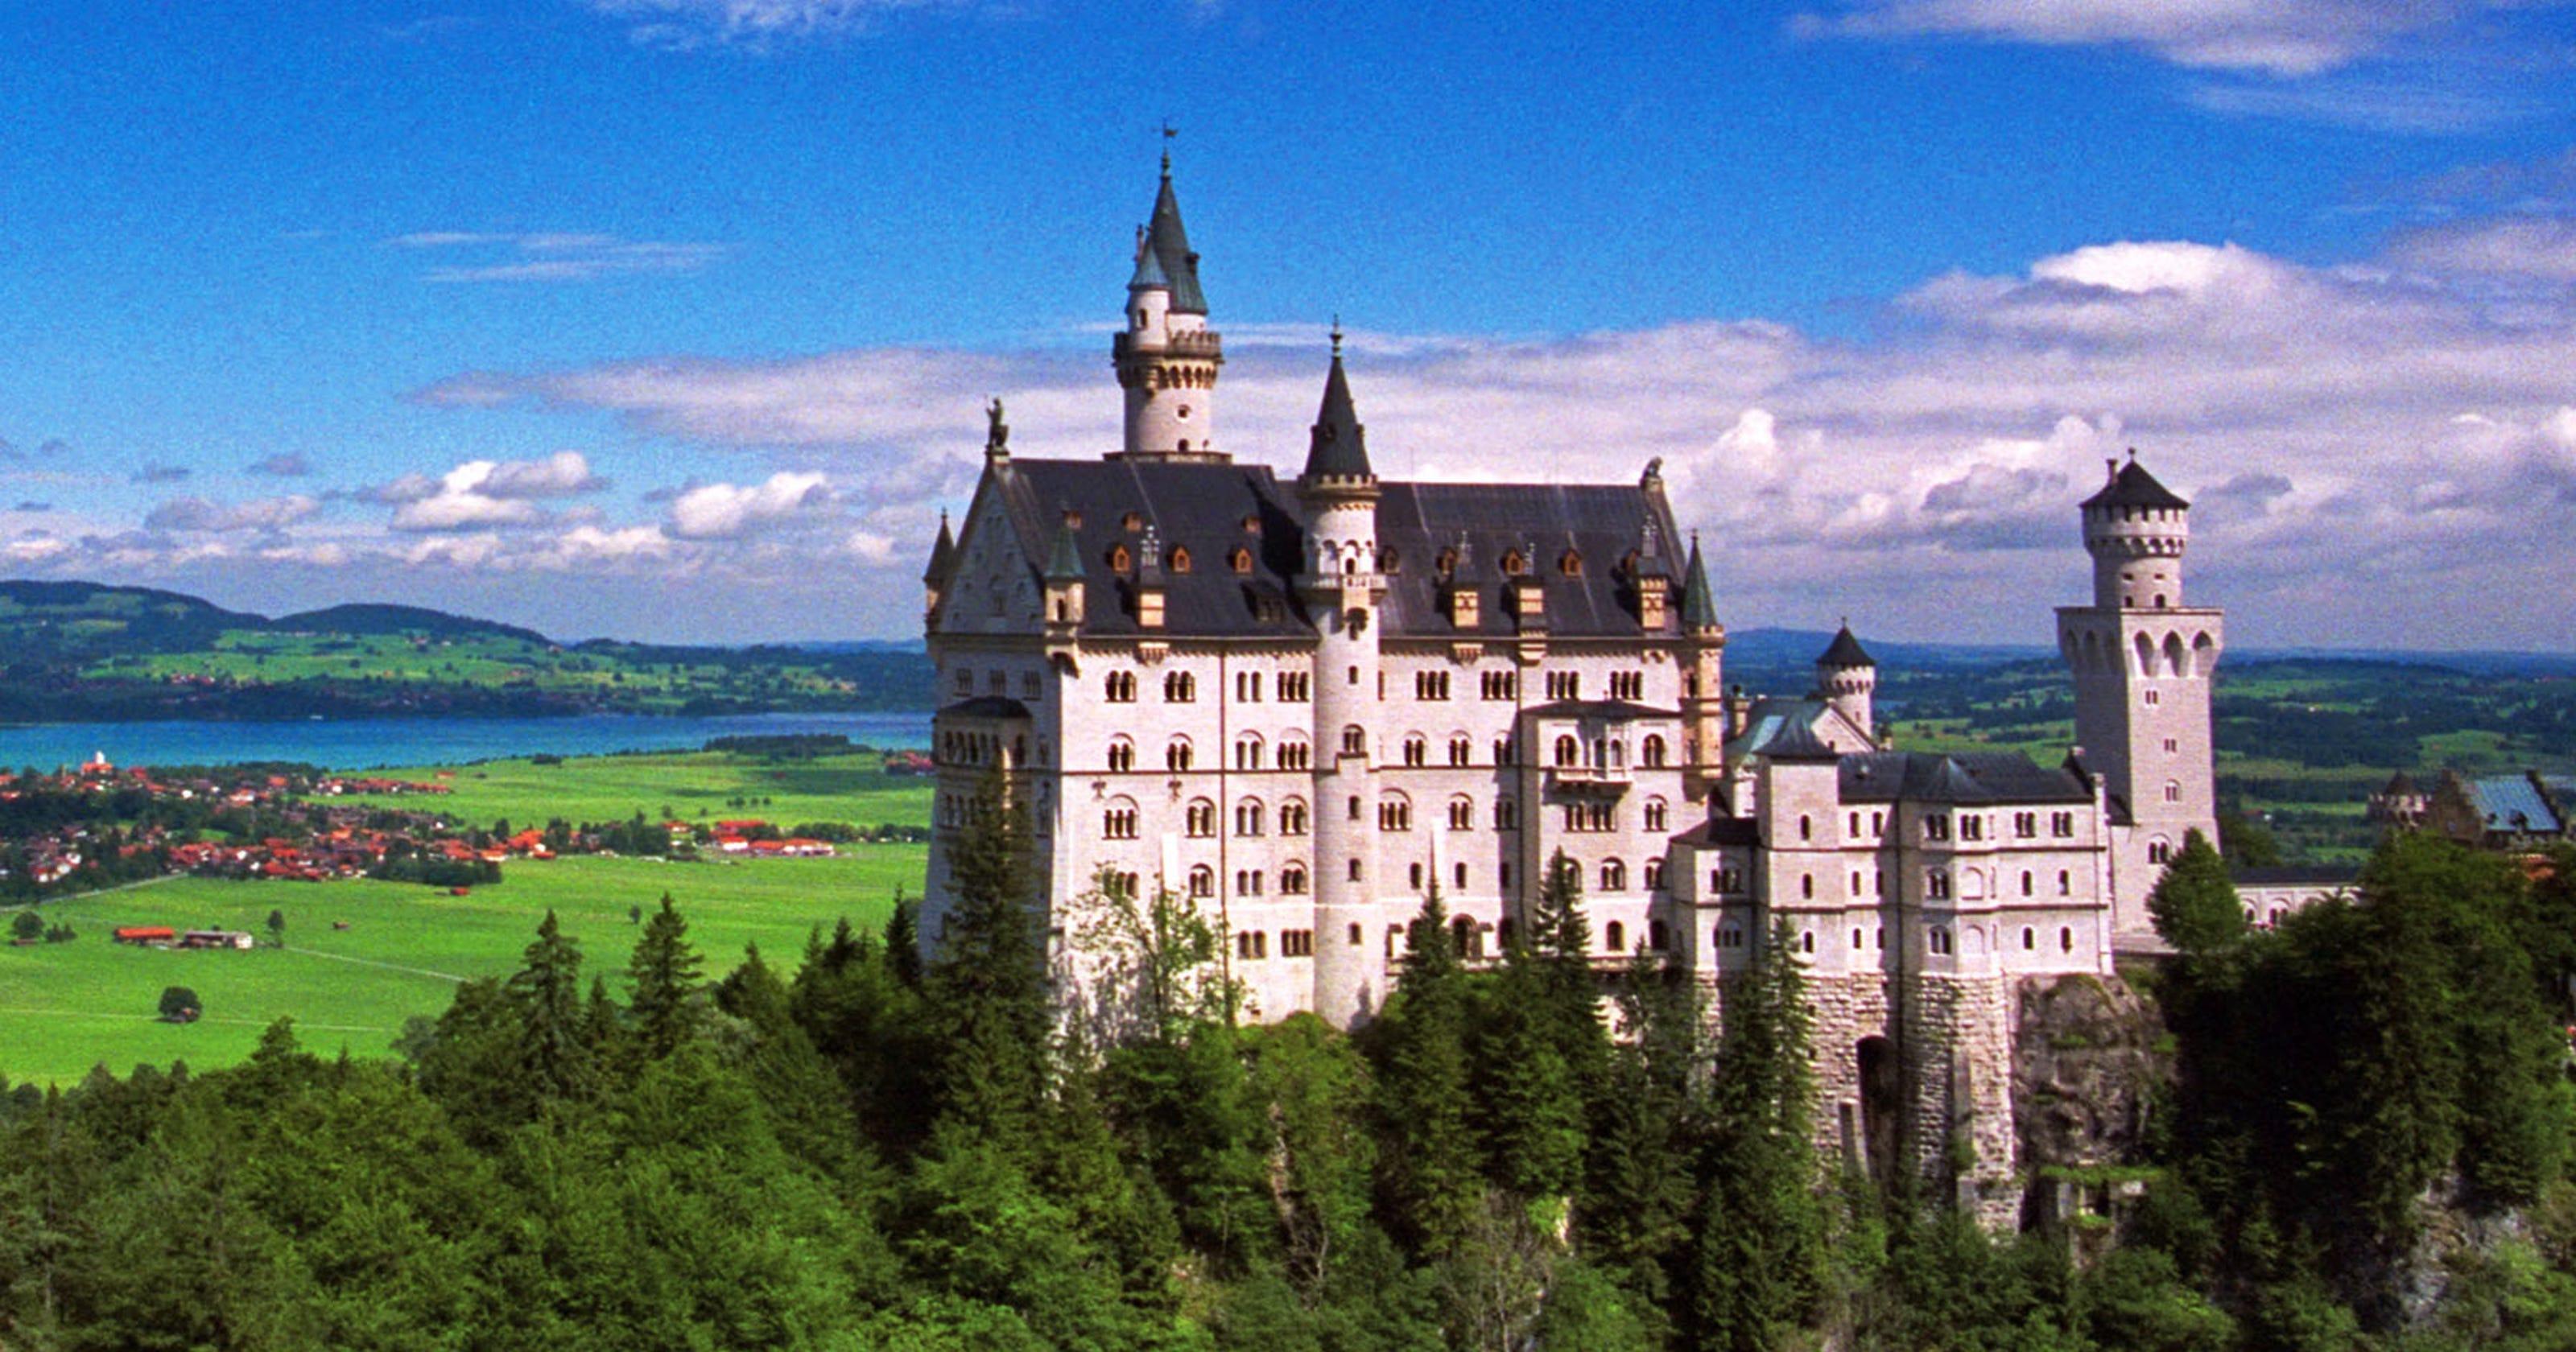 Rick Steves: Strikingly different castles offer worlds-apart